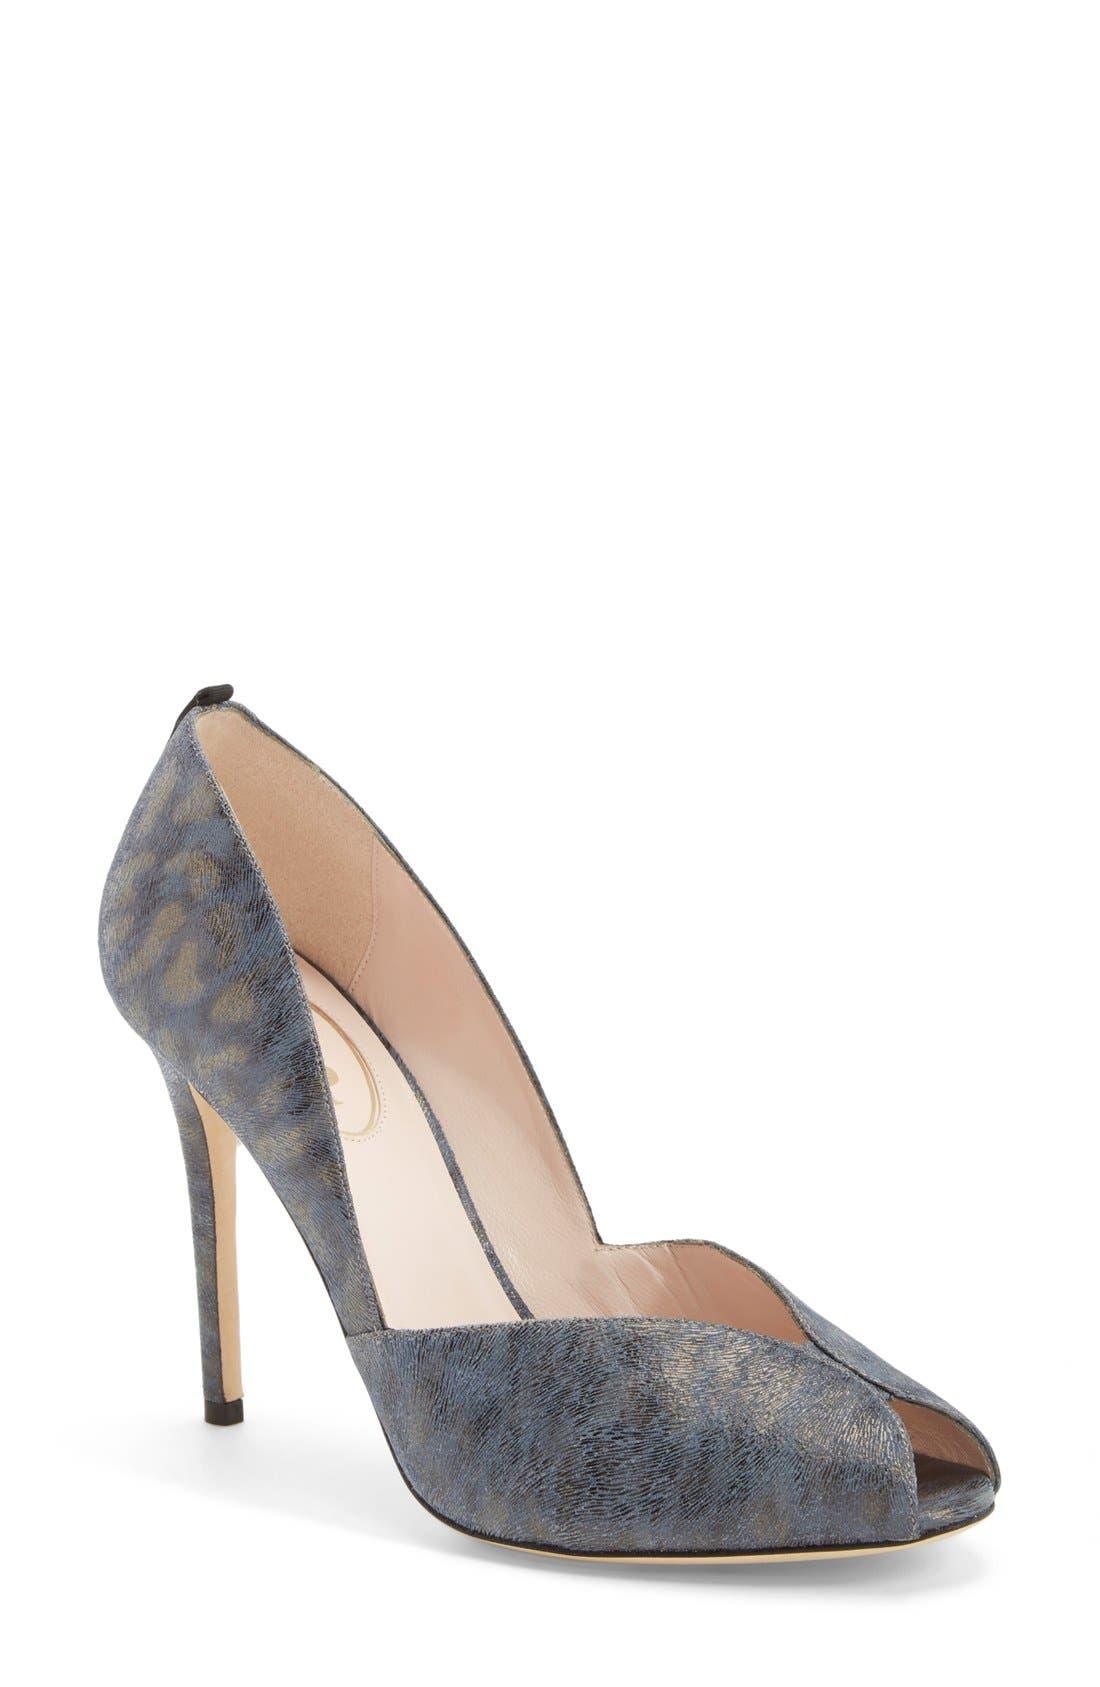 'Naomi' Peep Toe Pump,                         Main,                         color, Blue Leopard Leather